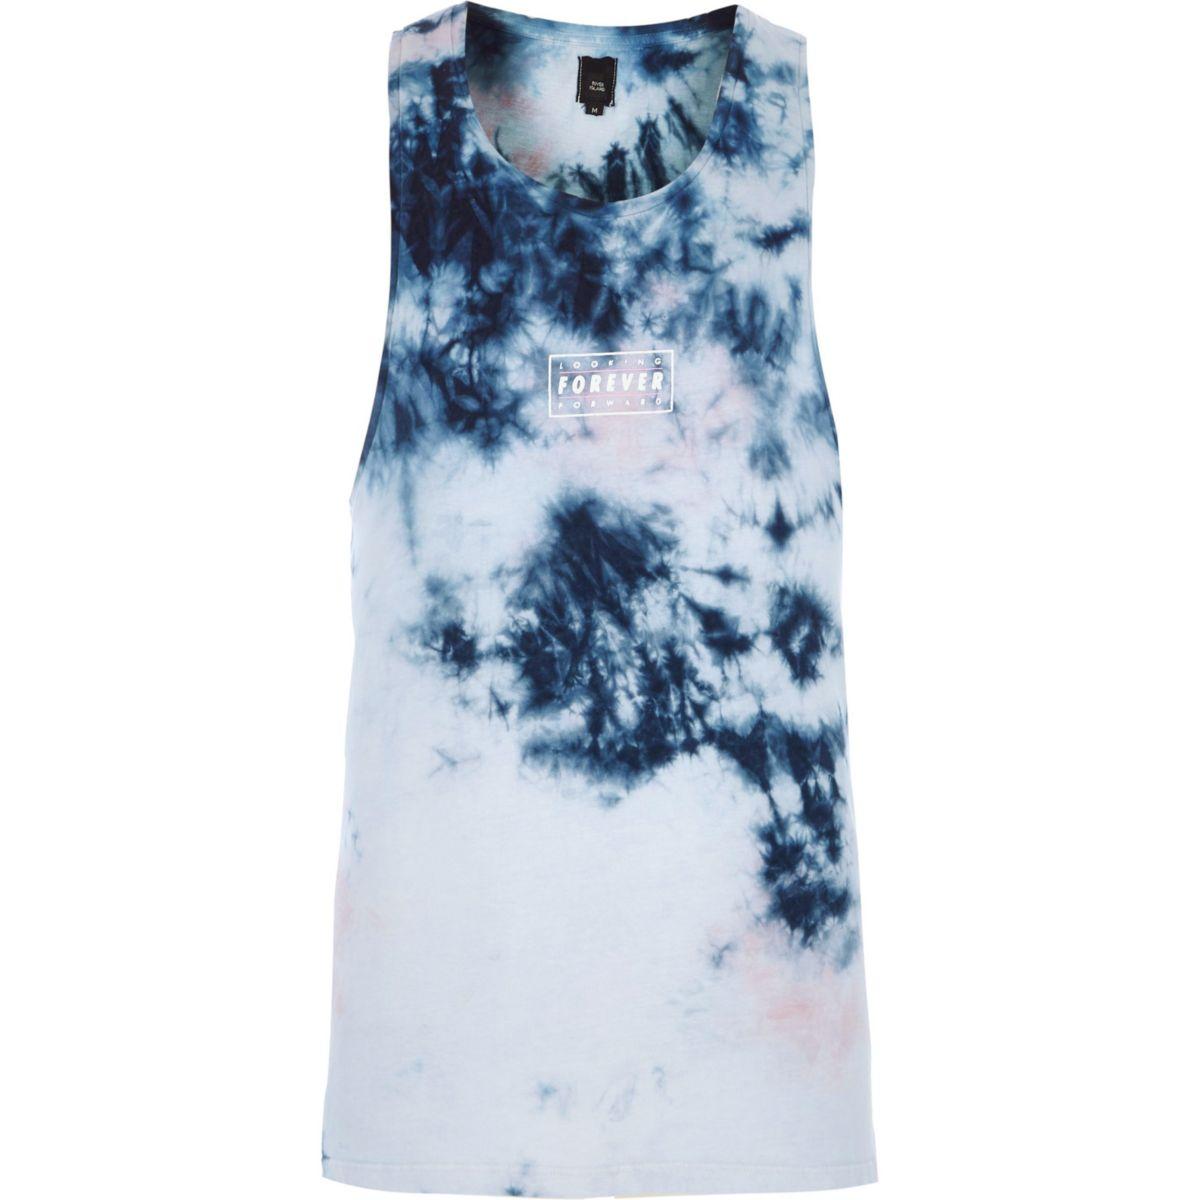 Débardeur tie-dye bleu à emmanchures tombantes